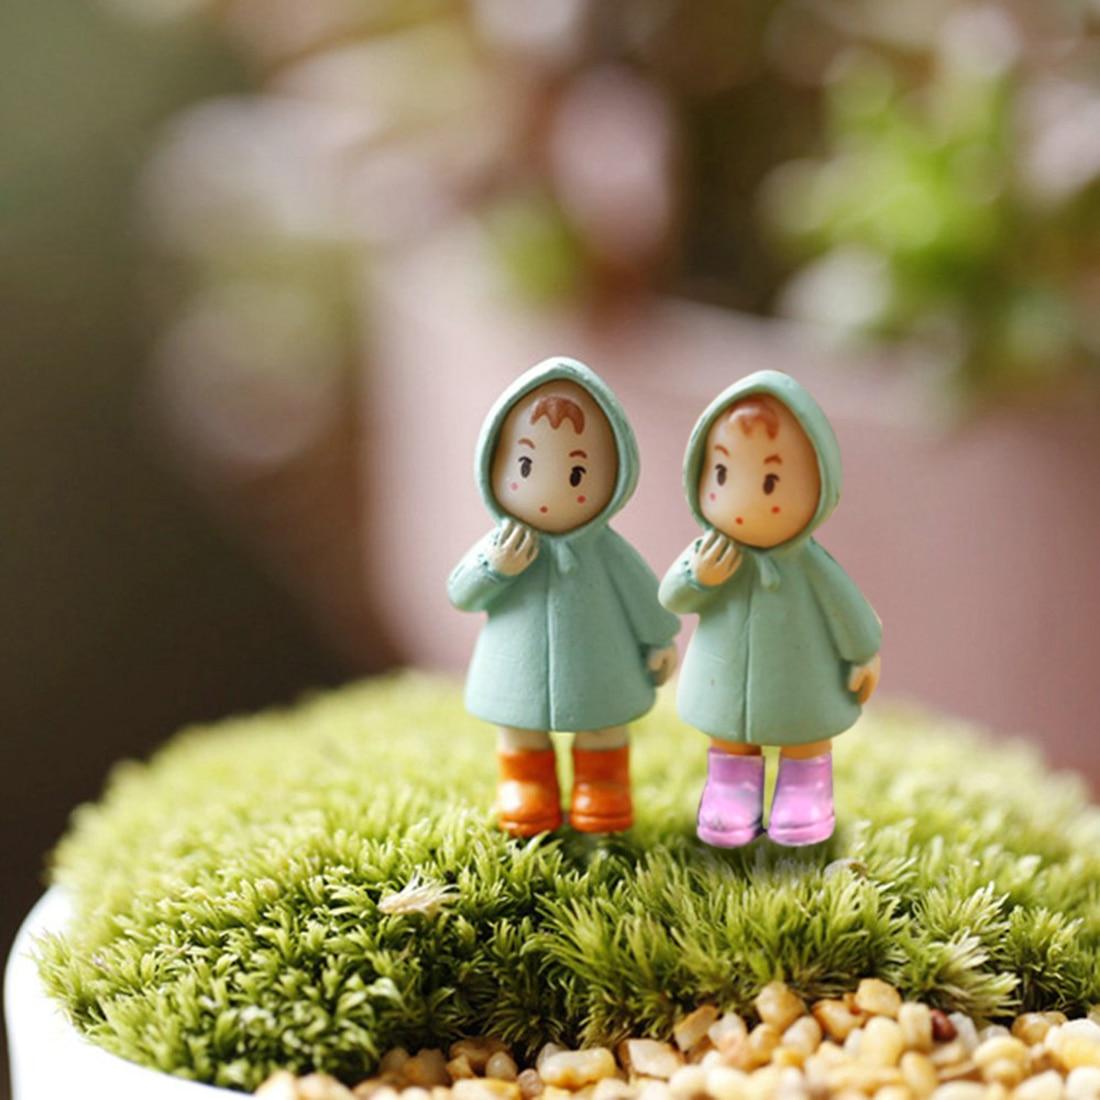 New 1PCS Cute Mini Figurines Miniature Girl Mei Resin Crafts Ornament Fairy Garden Gnomes Moss Terrariums Home Decorations